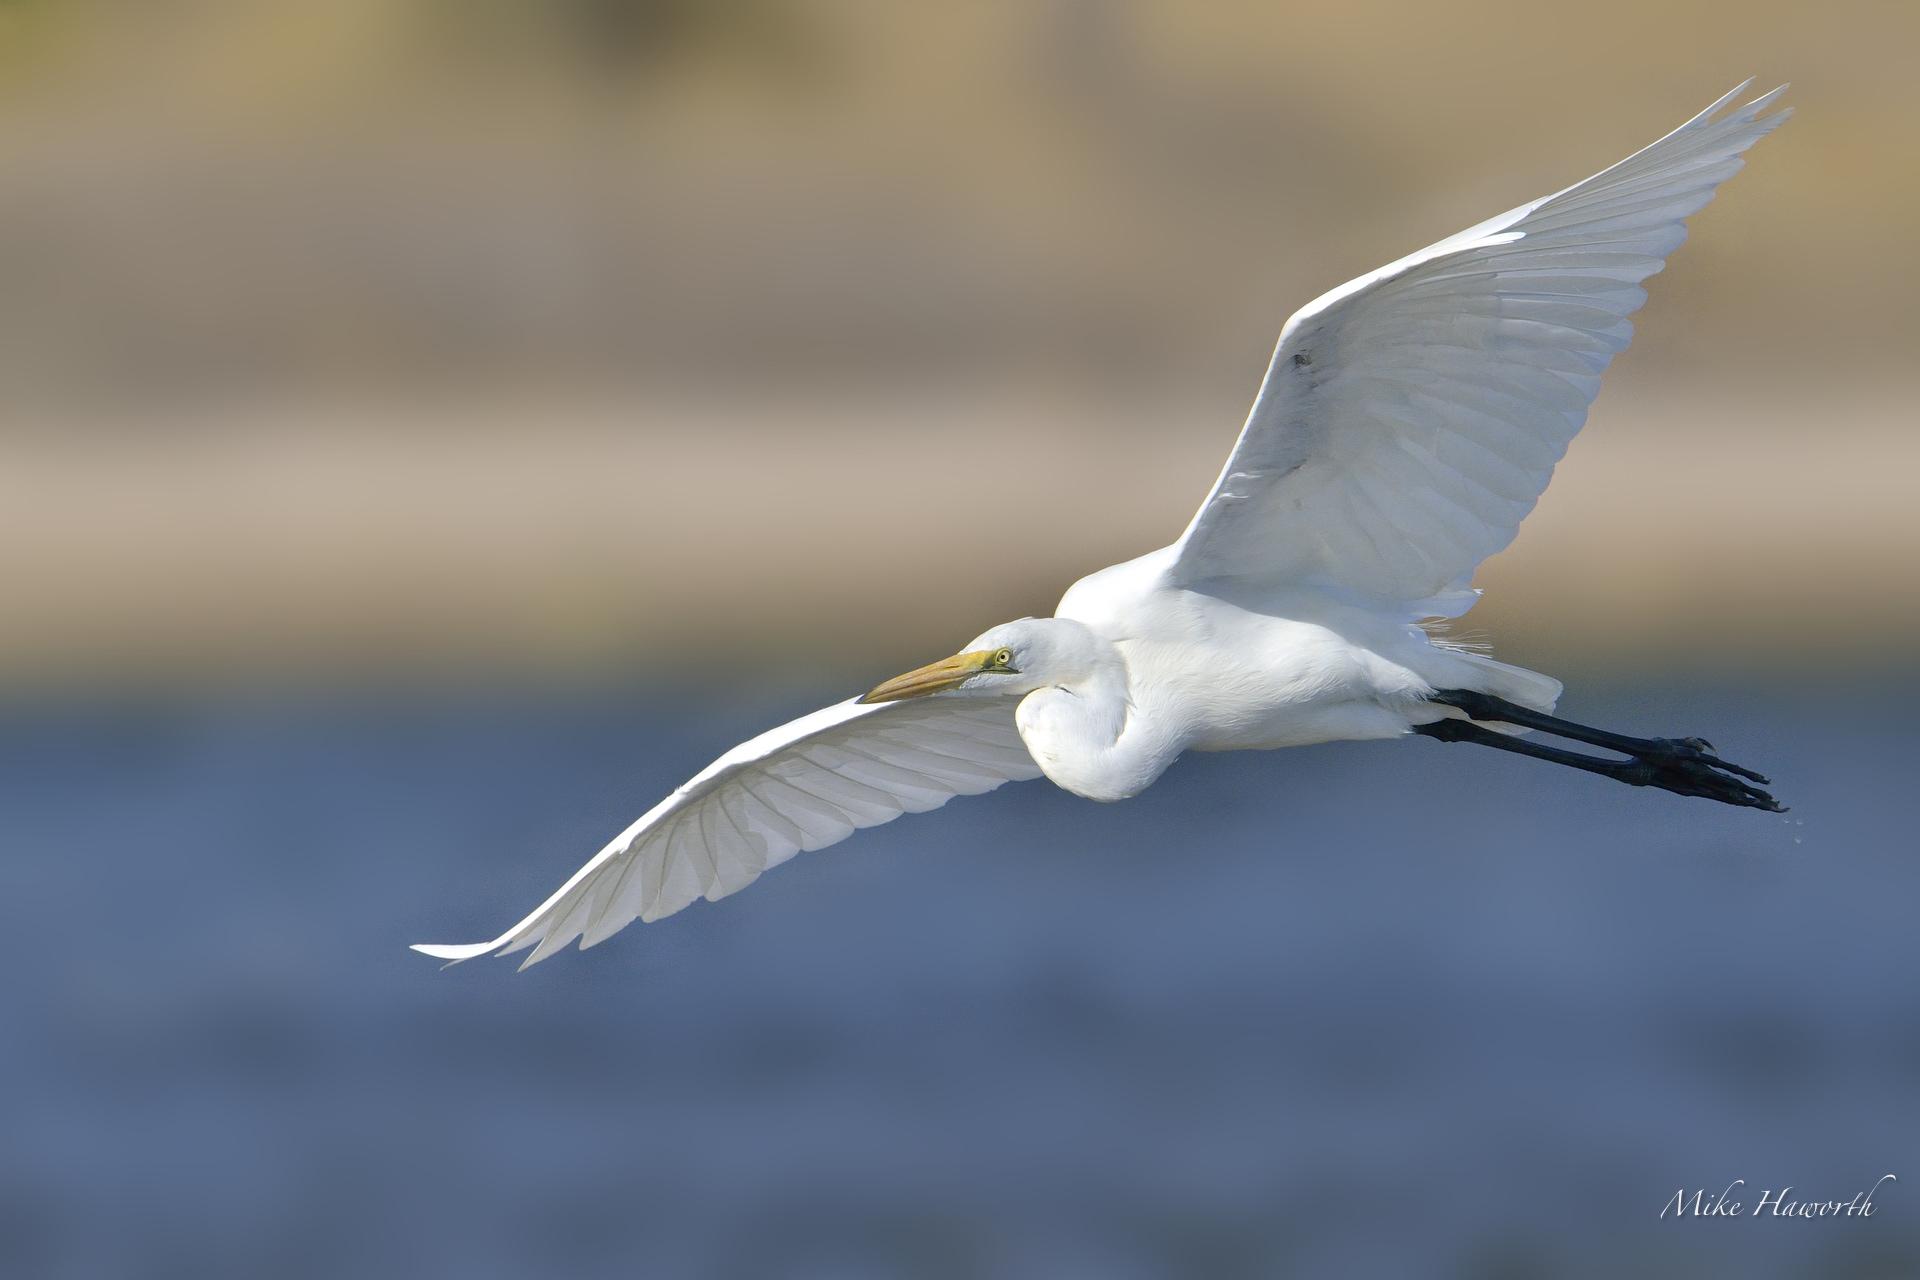 Chobe Photography \u2013 flying birds Howie\u002639;s Wildlife Images